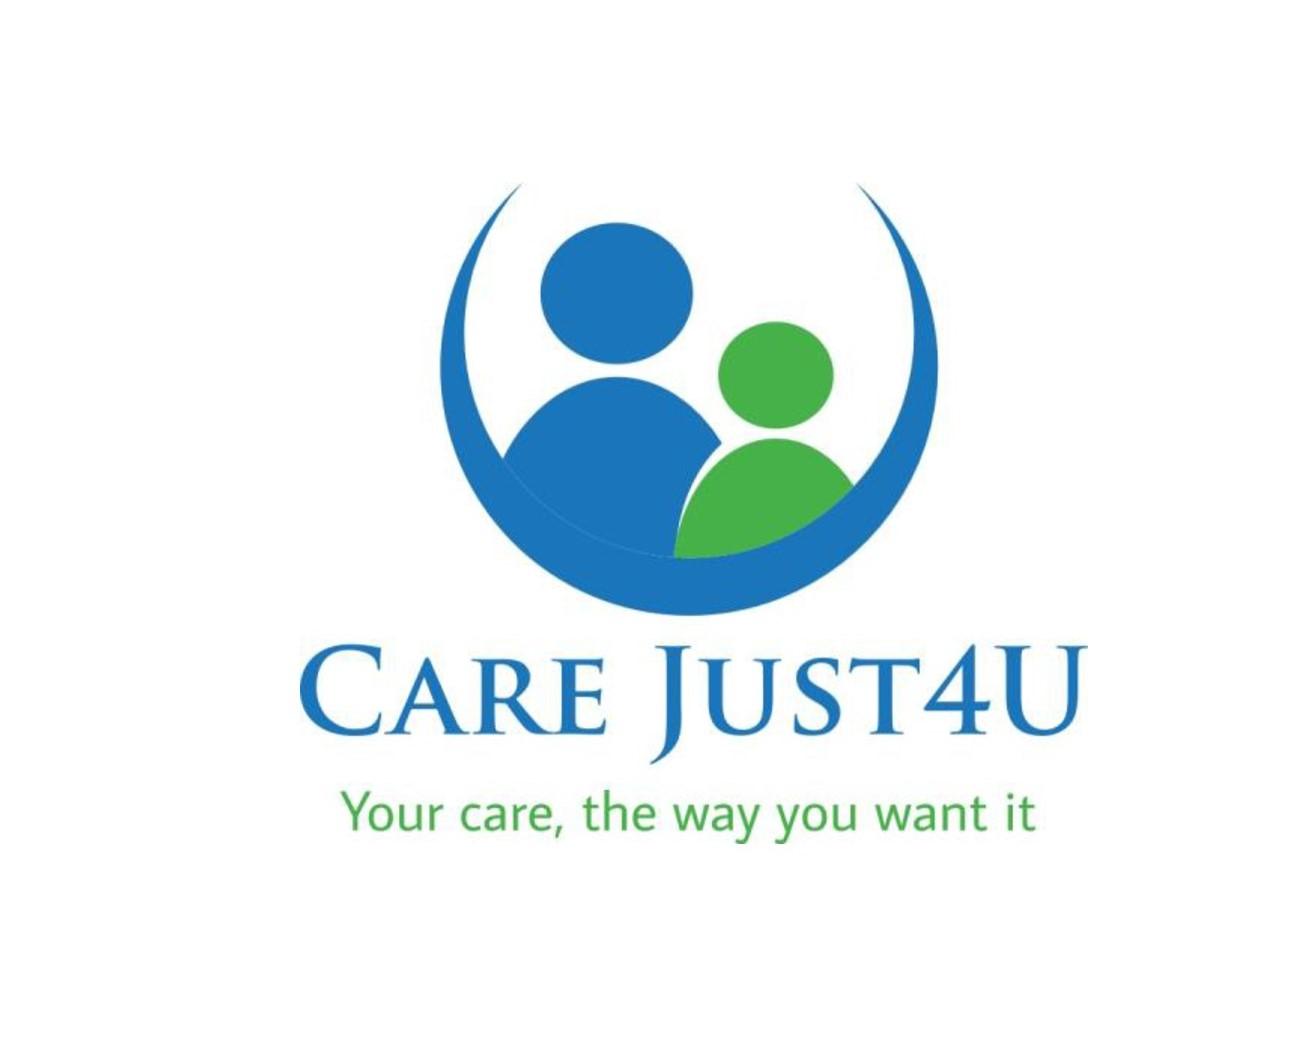 Care Just4U